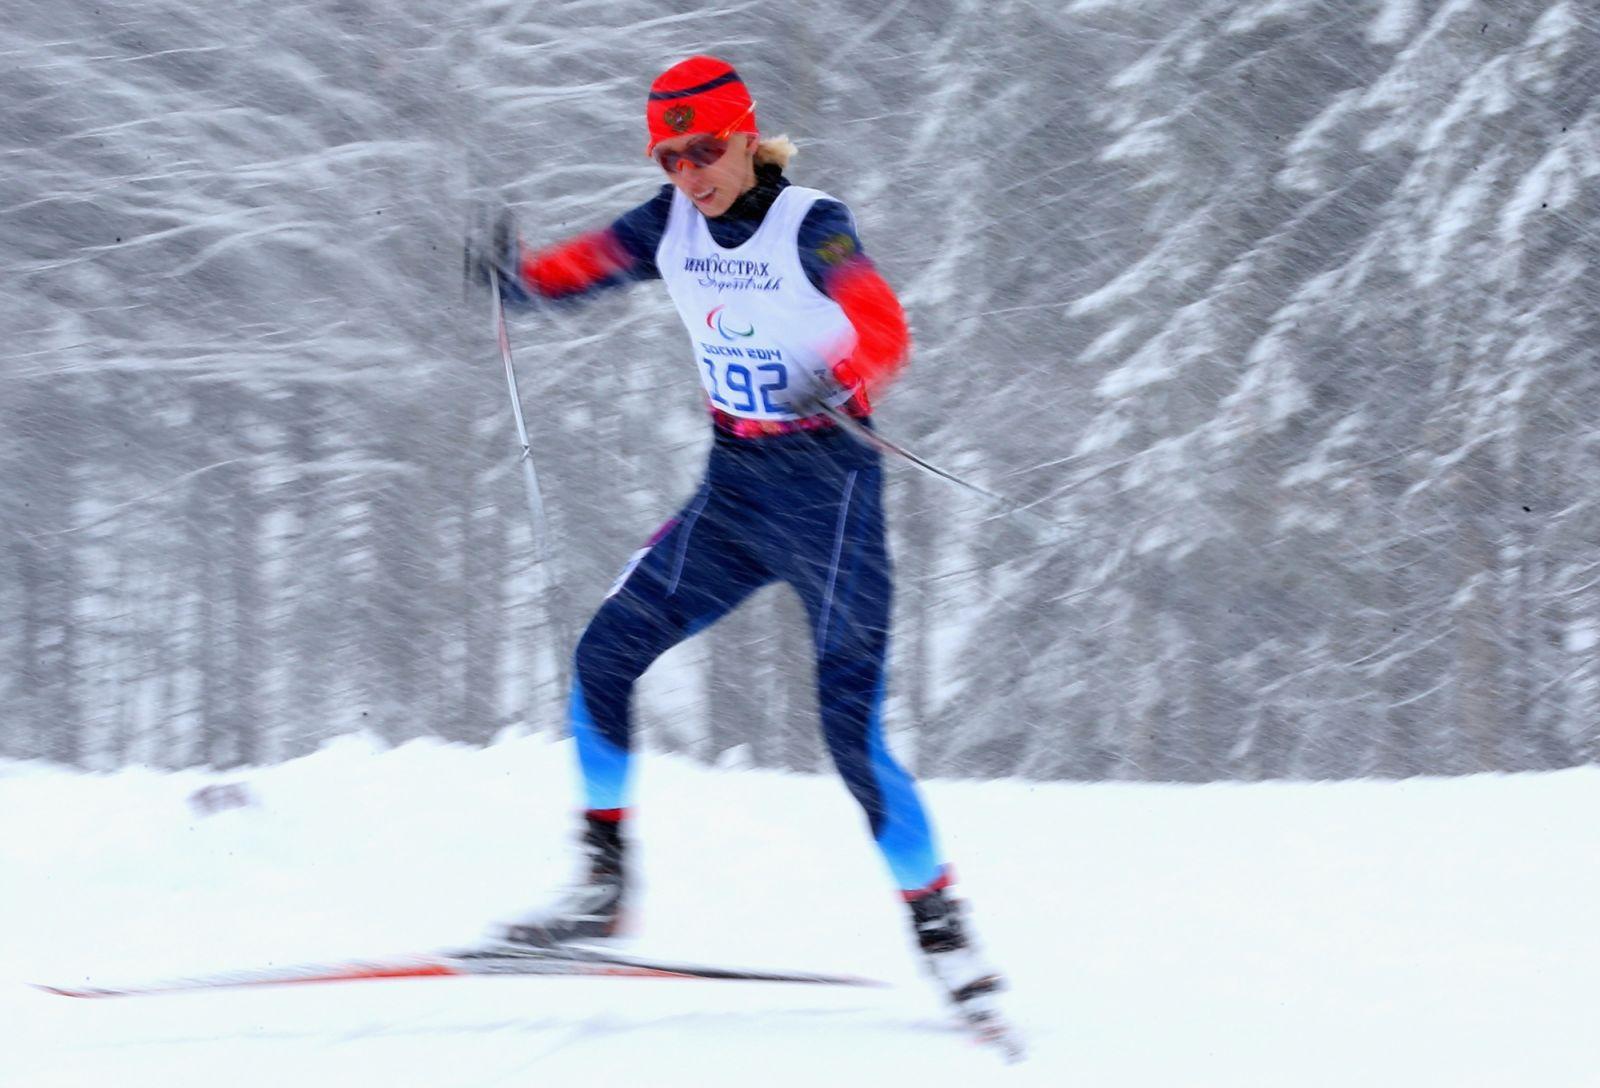 Послы паралимпийского спорта. Михалина Лысова